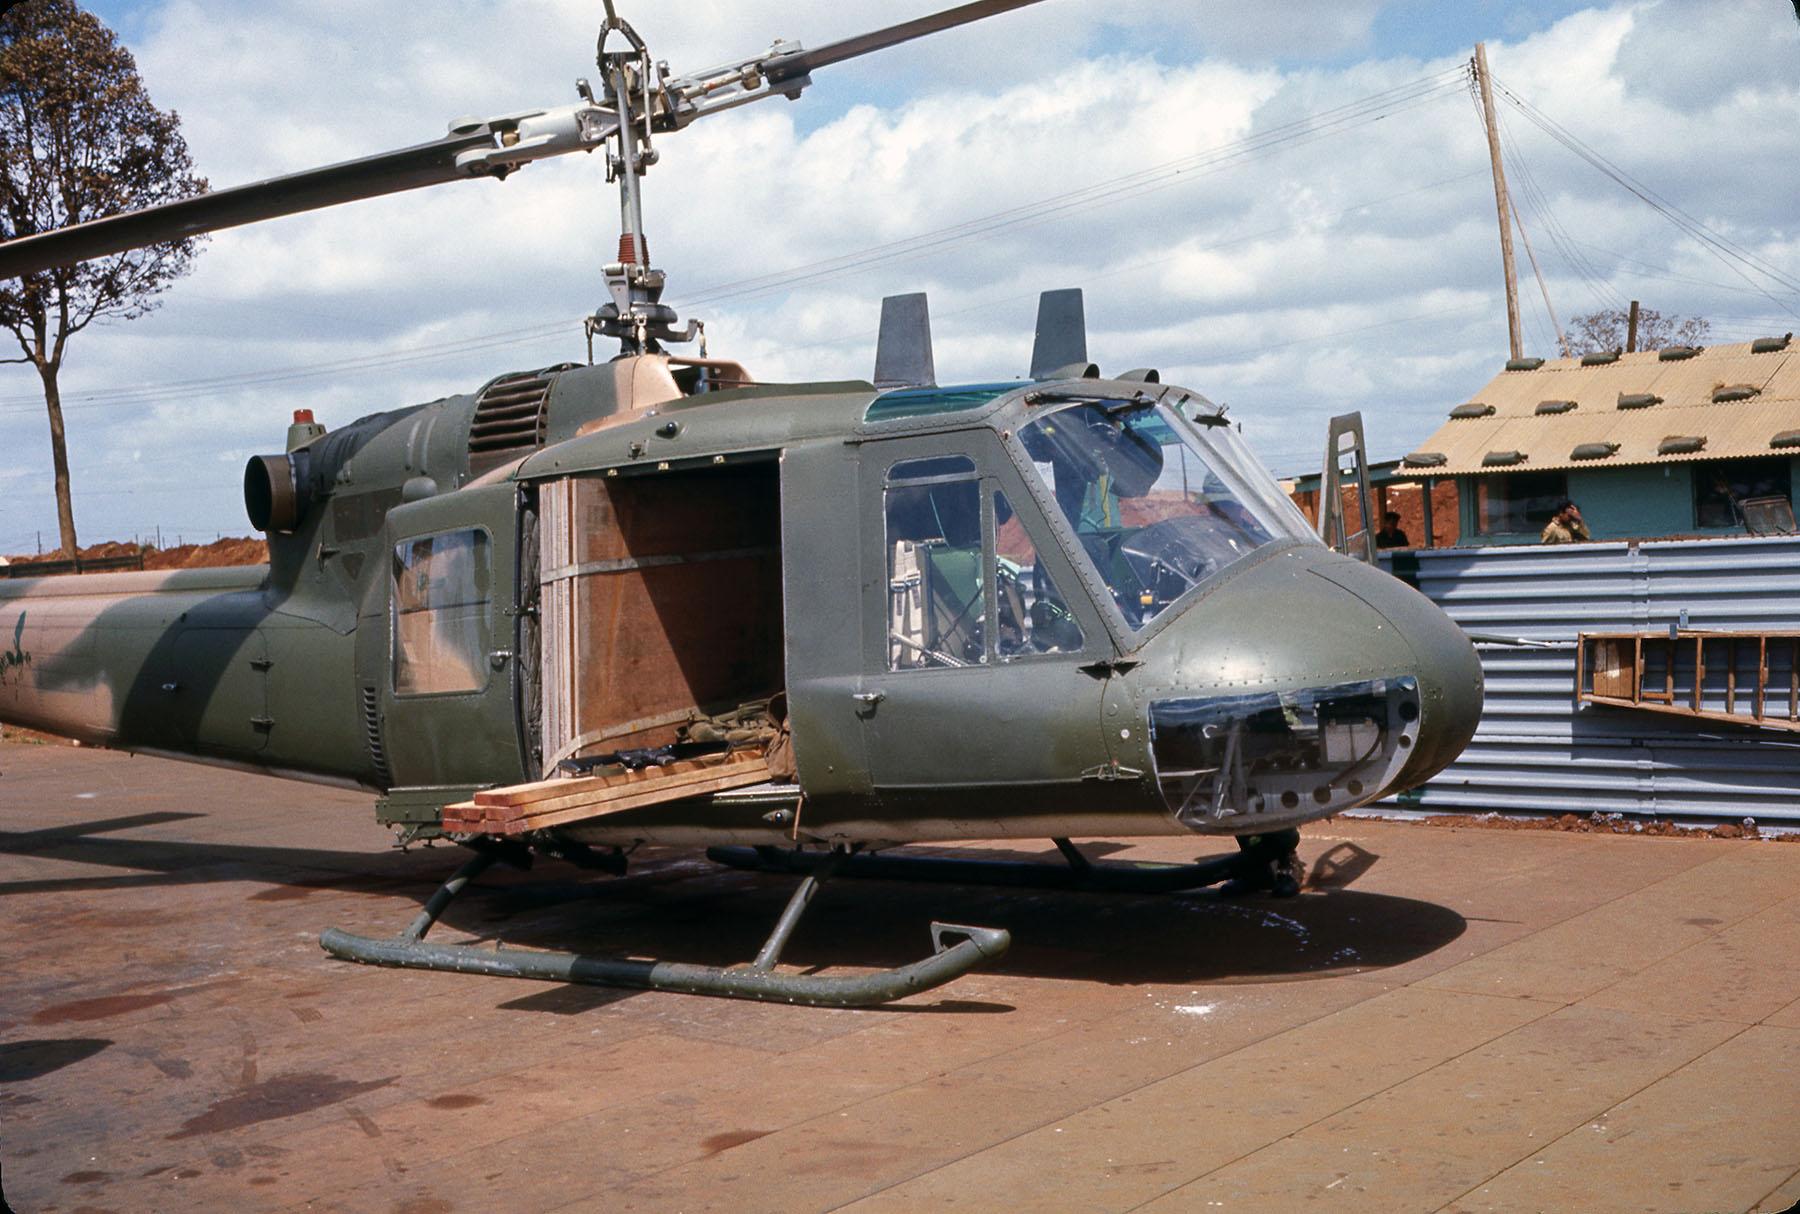 Secret War: Green Hornets, Dust Devils and Blackbirds > National